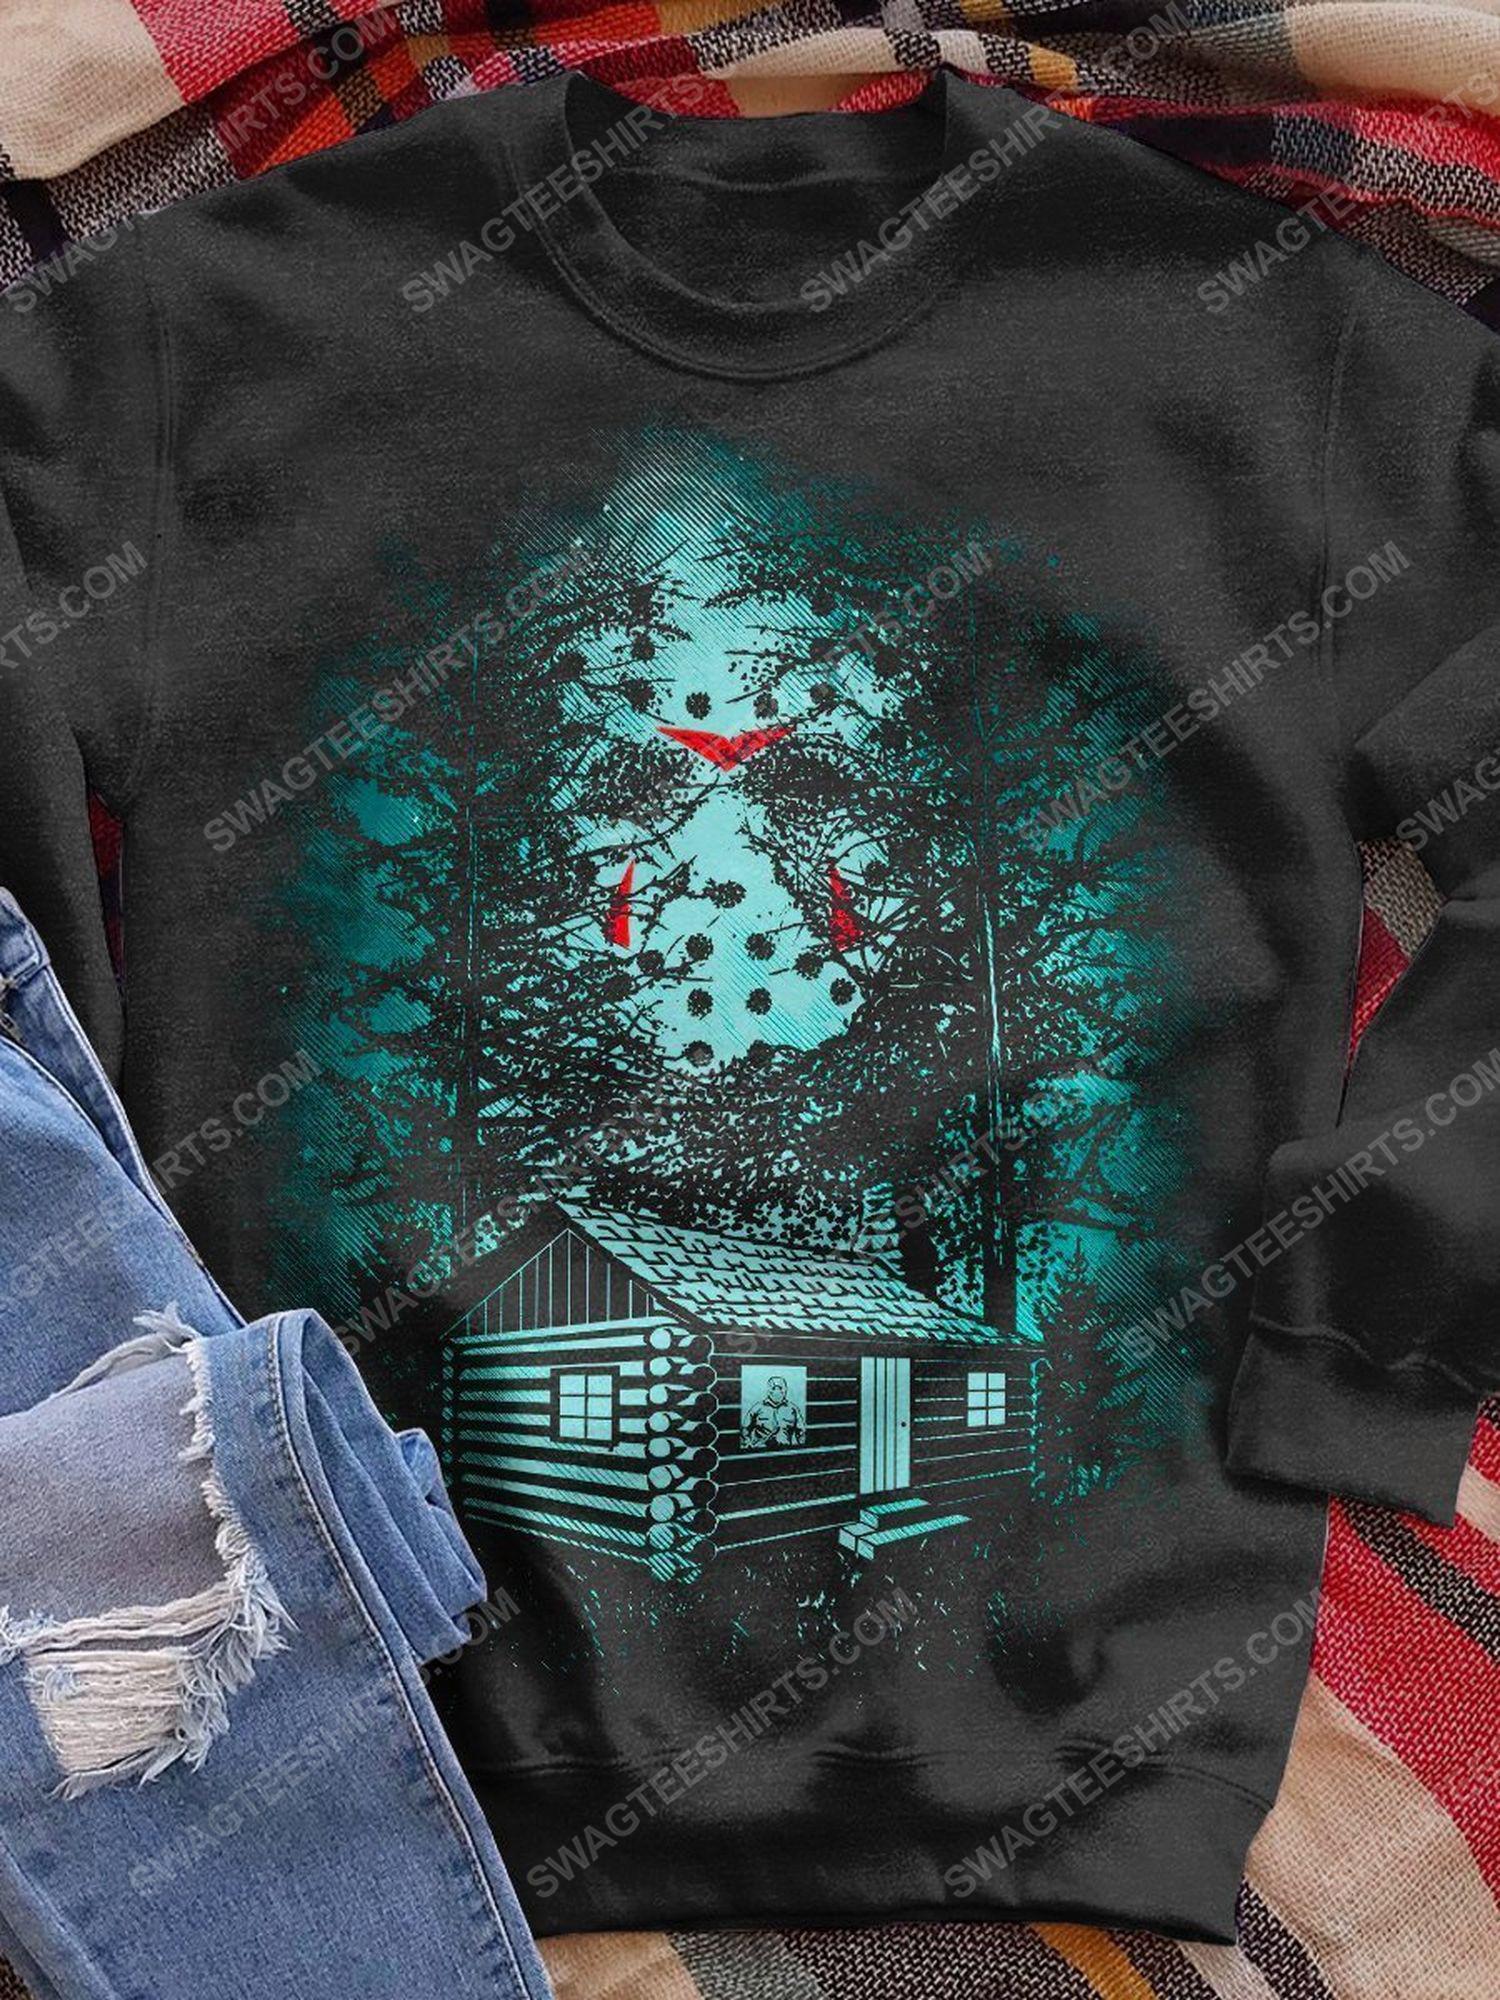 Halloween jason voorhees friday the 13th series shirt 1 - Copy (2)